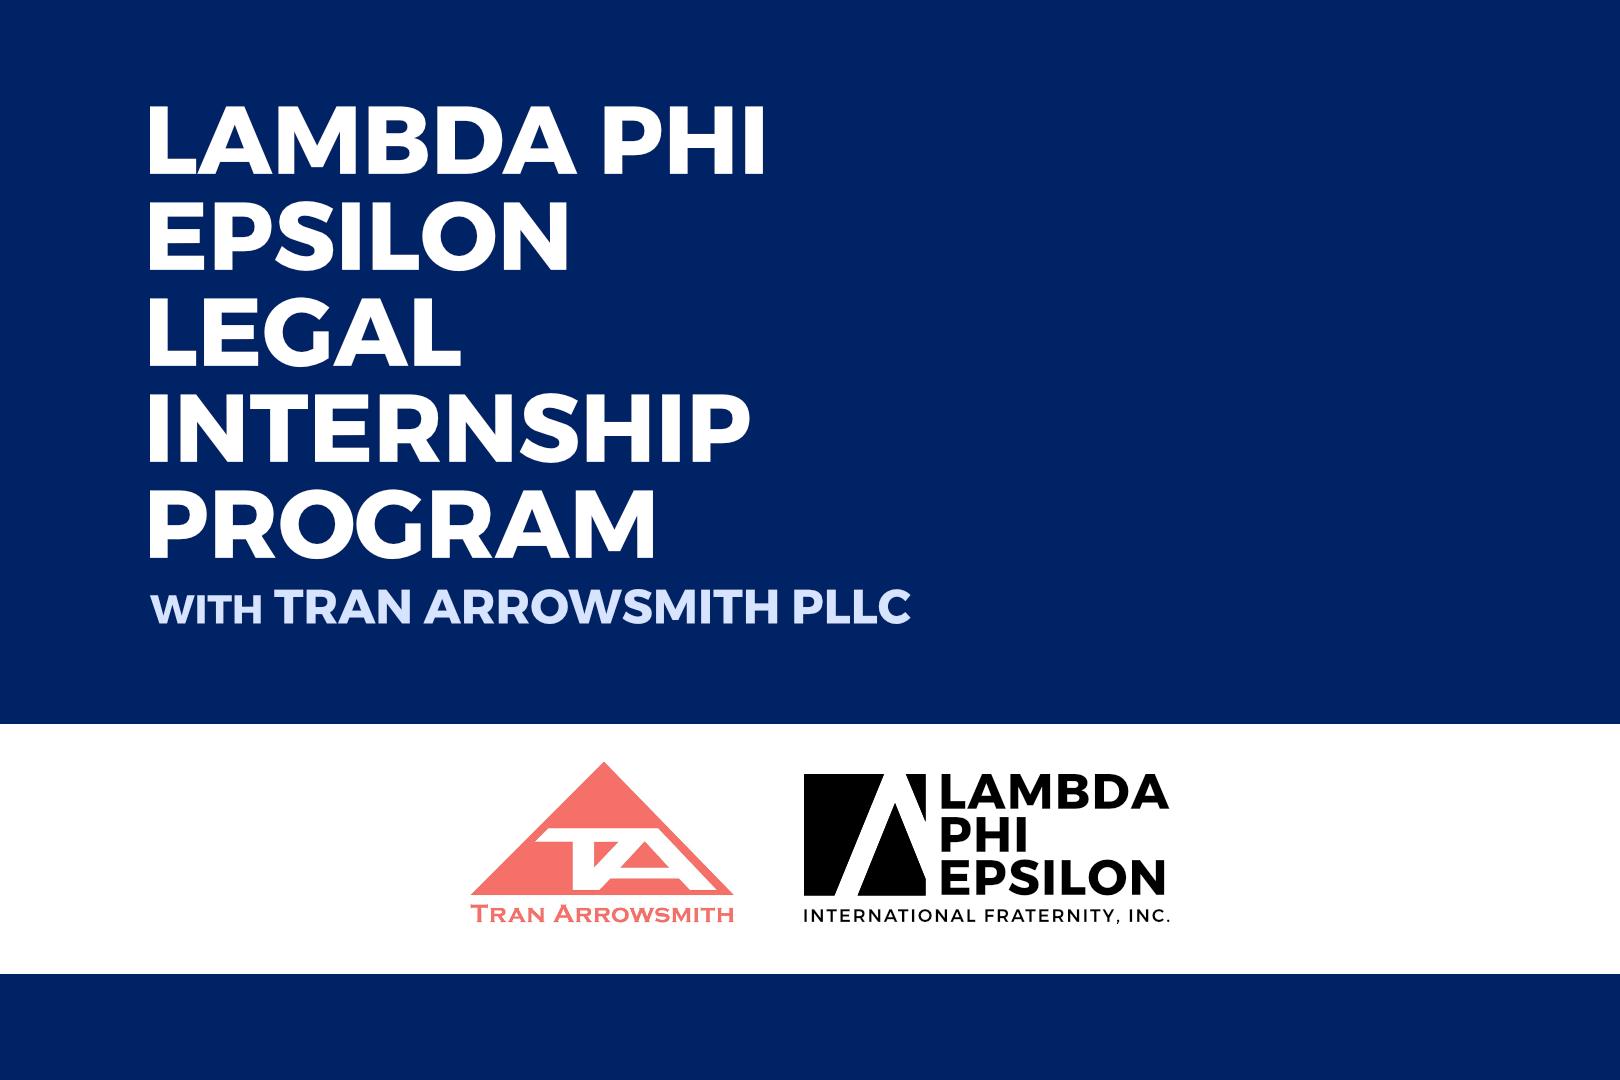 Legal Internship Program Announcement